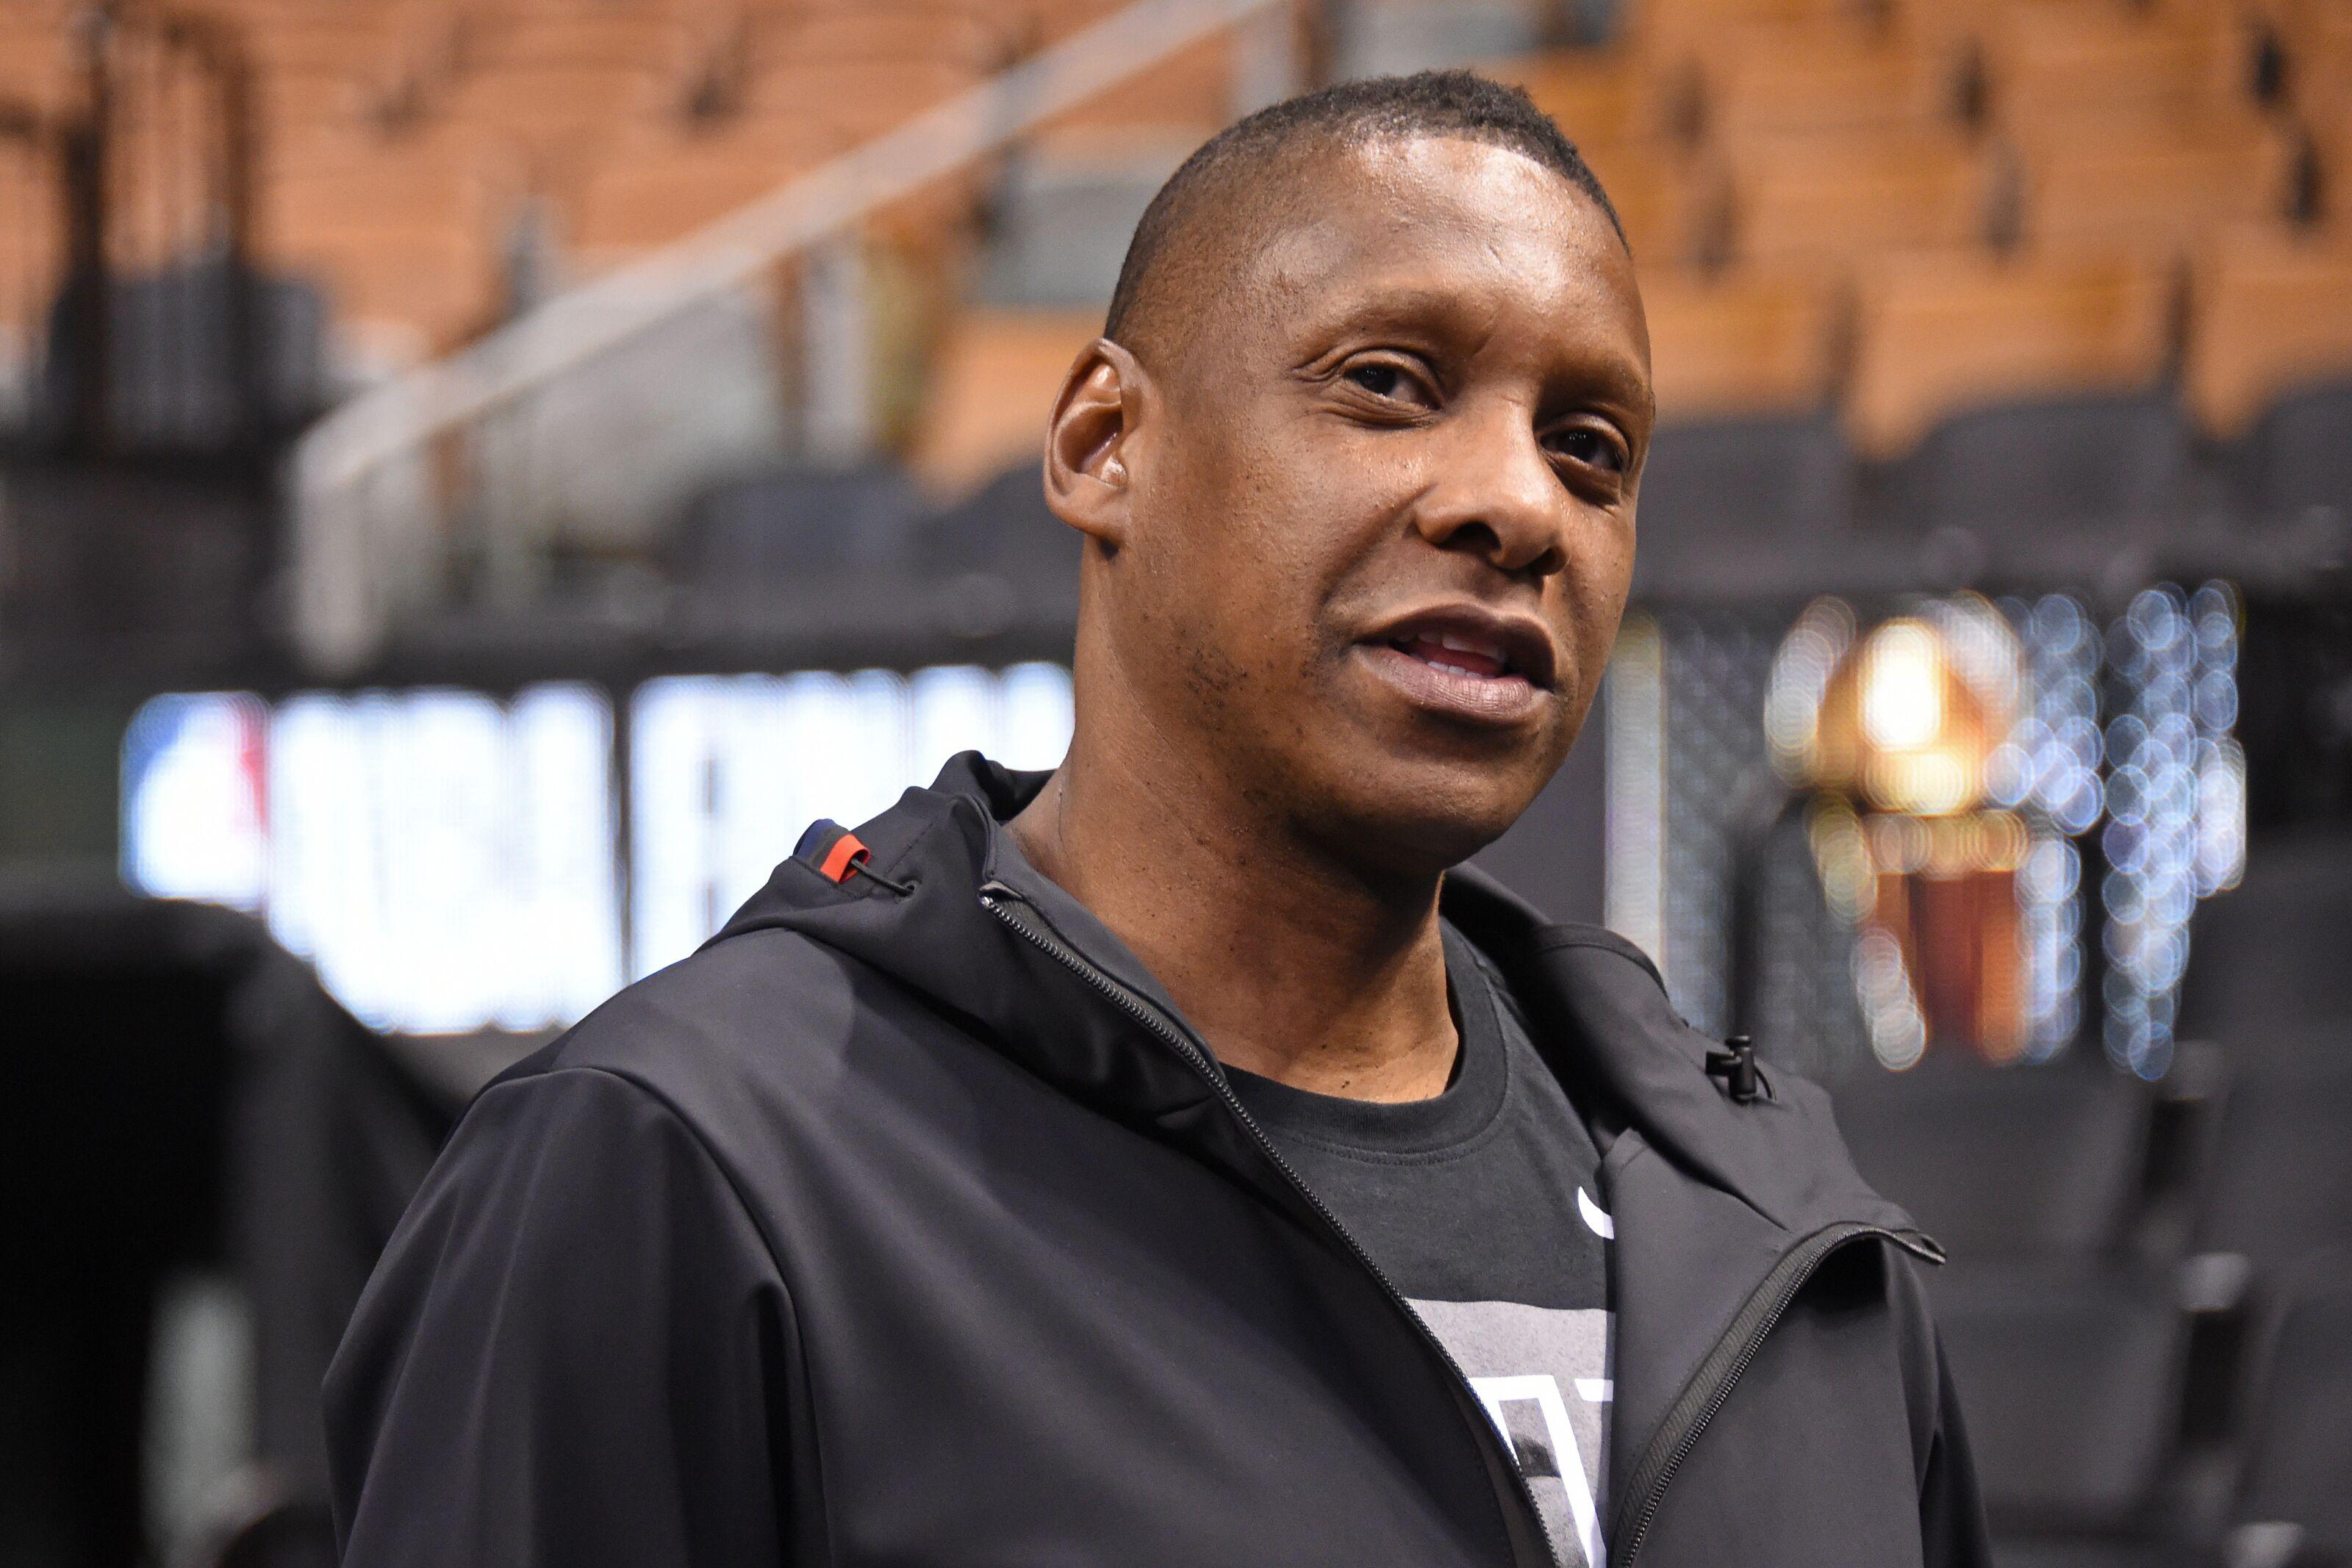 Knicks rumors: Masai Ujiri eyed as Steve Mills' potential replacement